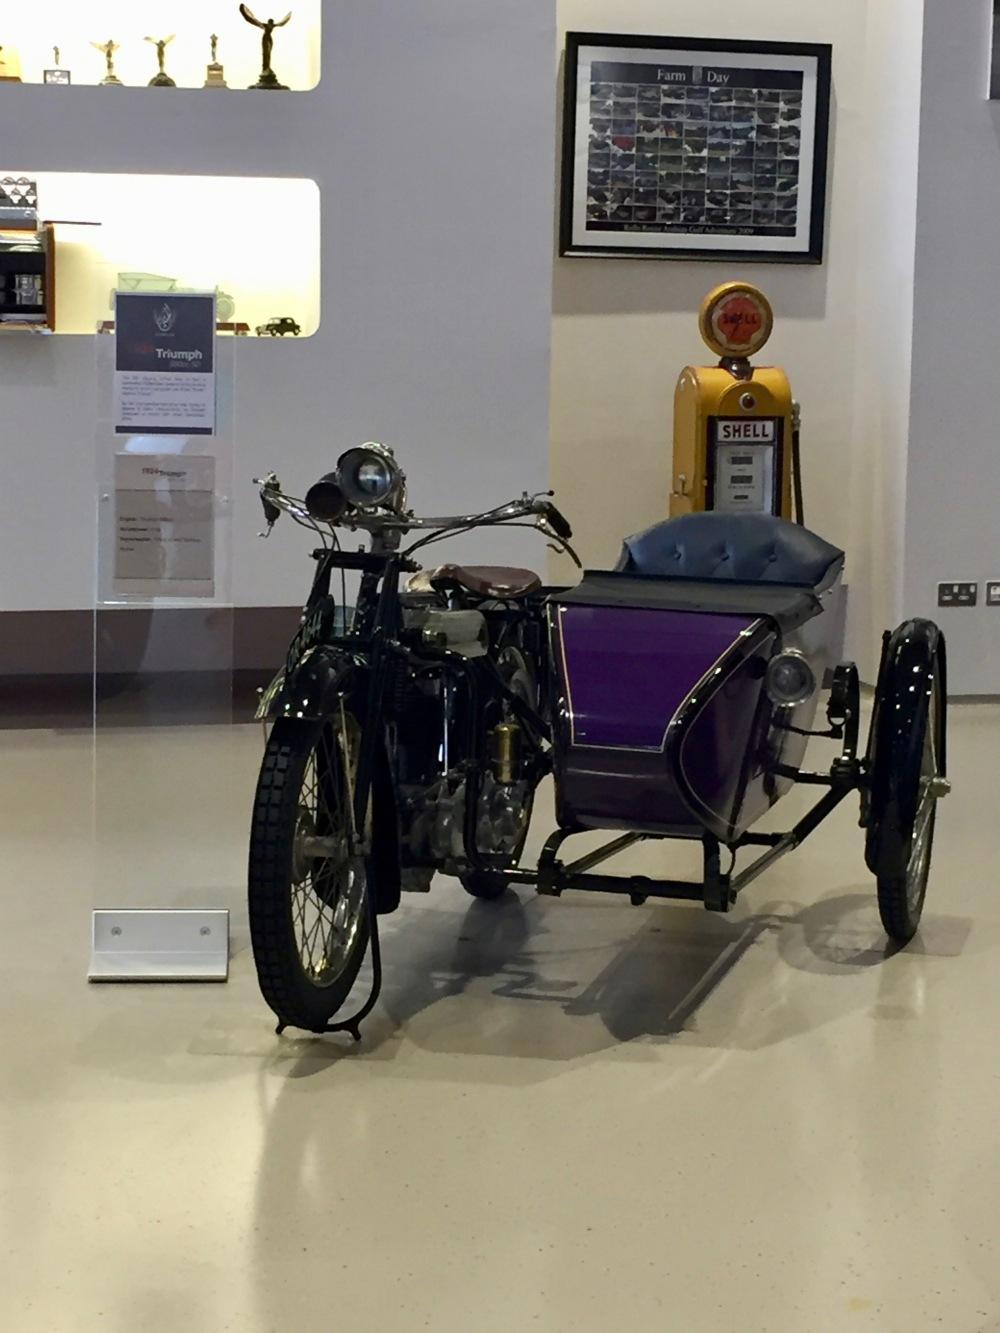 Al Khor, Qatar - Al-Fardan Private Luxury Car Collection - Motorcycle Collection - 1924 Triumph